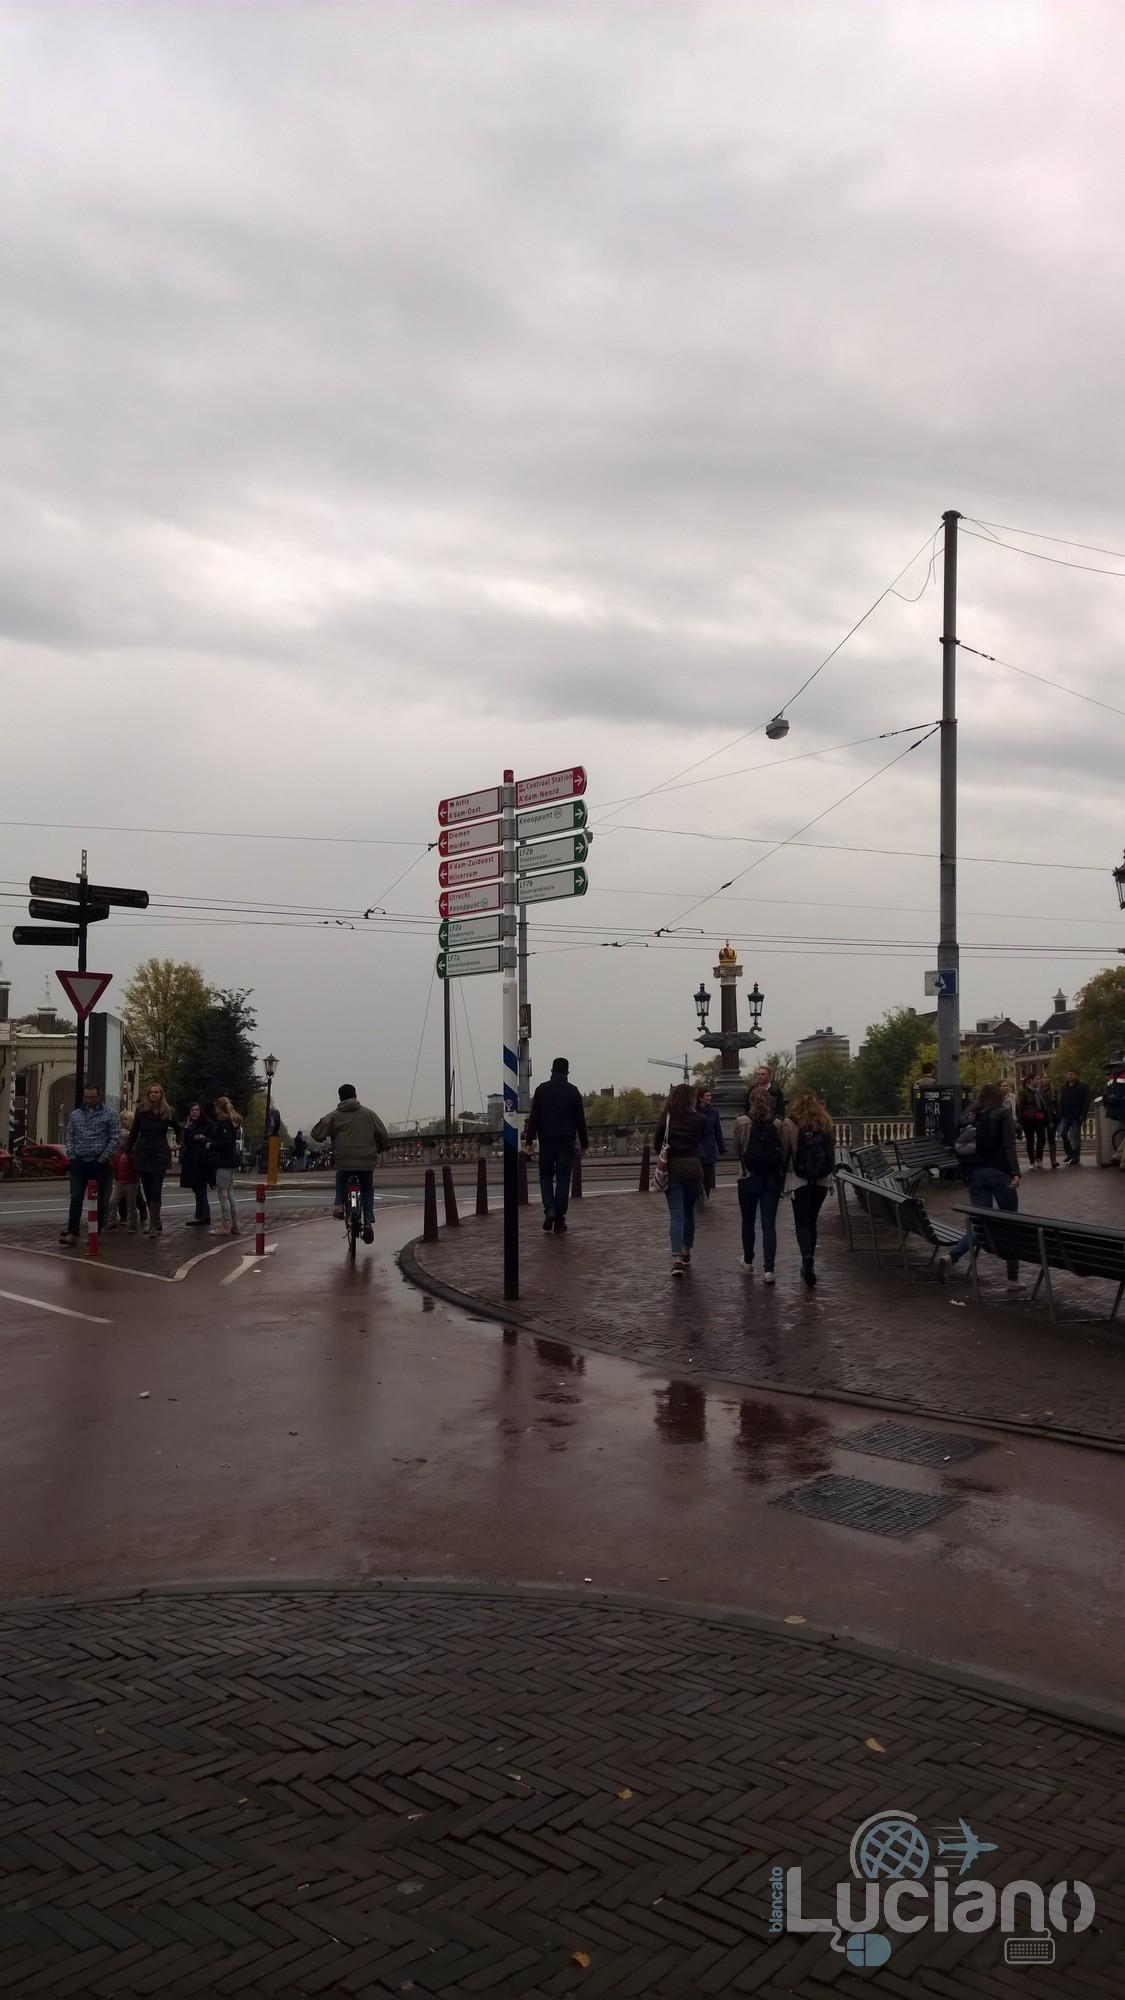 amsterdam-2014-vueling-lucianoblancatoit (180)